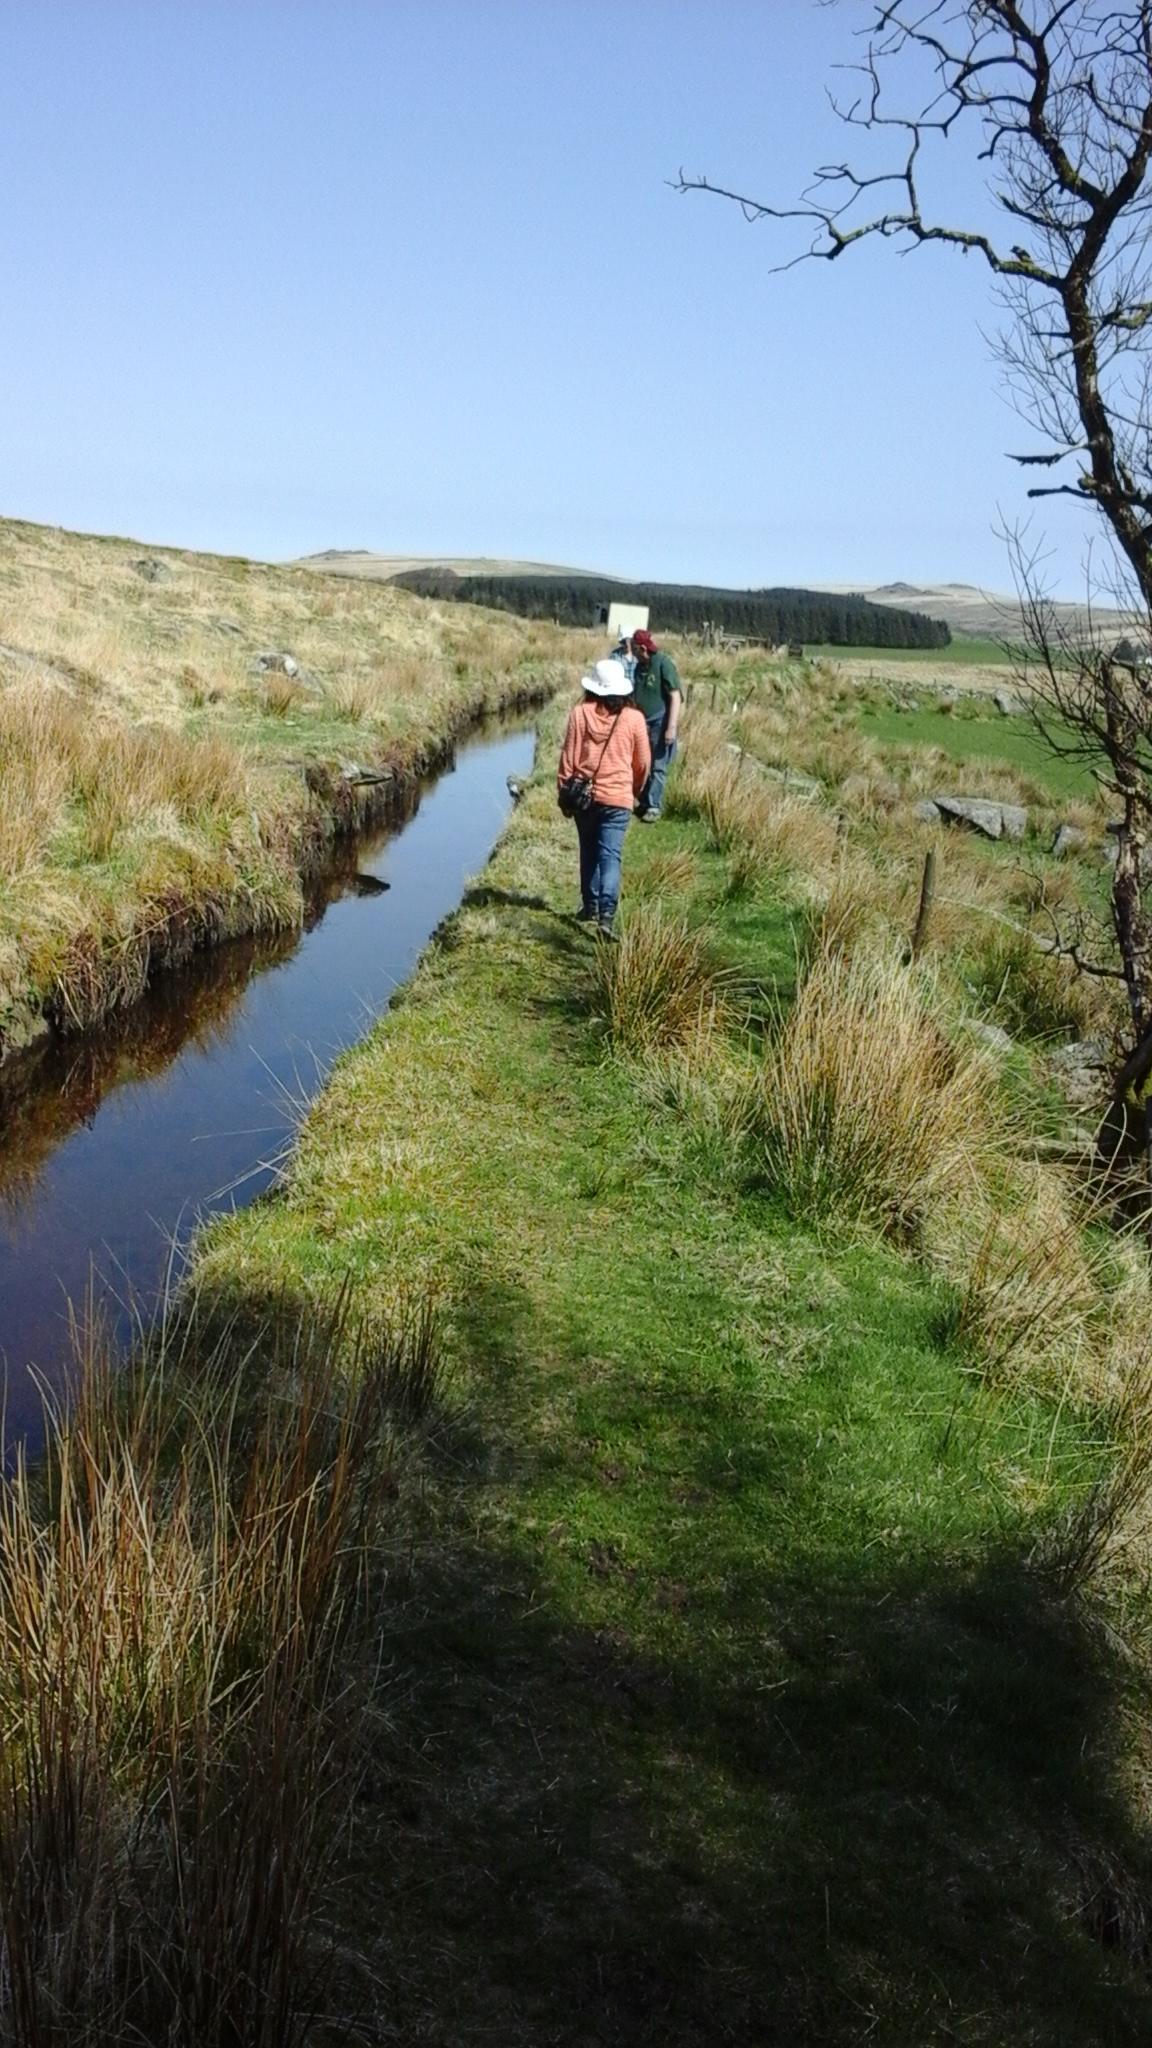 ViewRanger - Devonport Leat - Walking route in Princetown, Devon